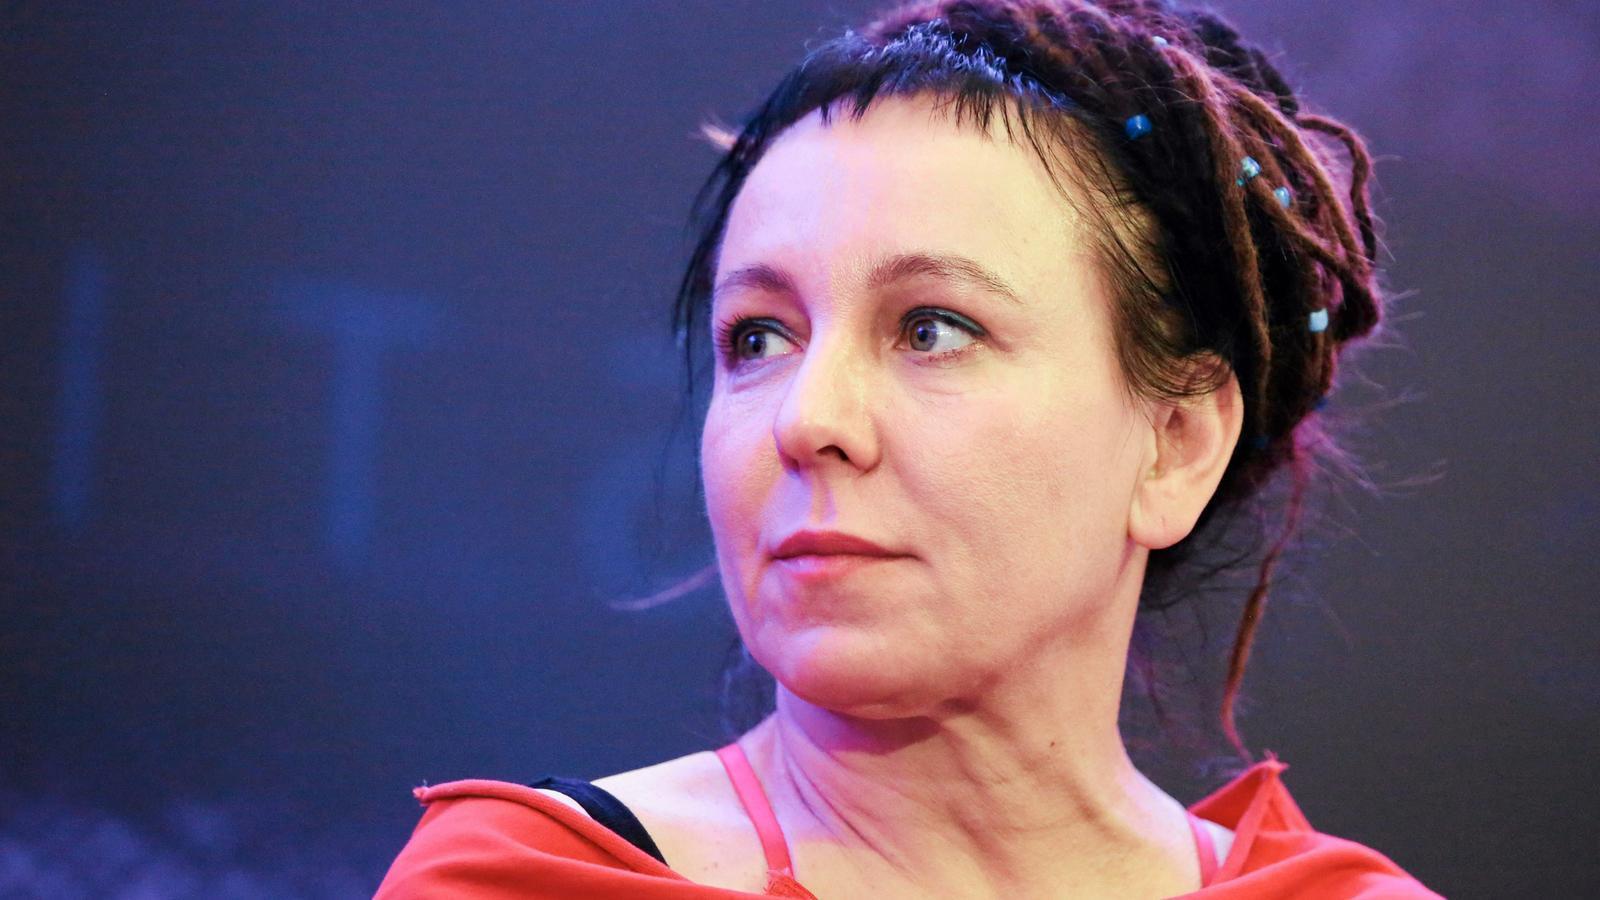 L'escriptora Olga Tokarczuk